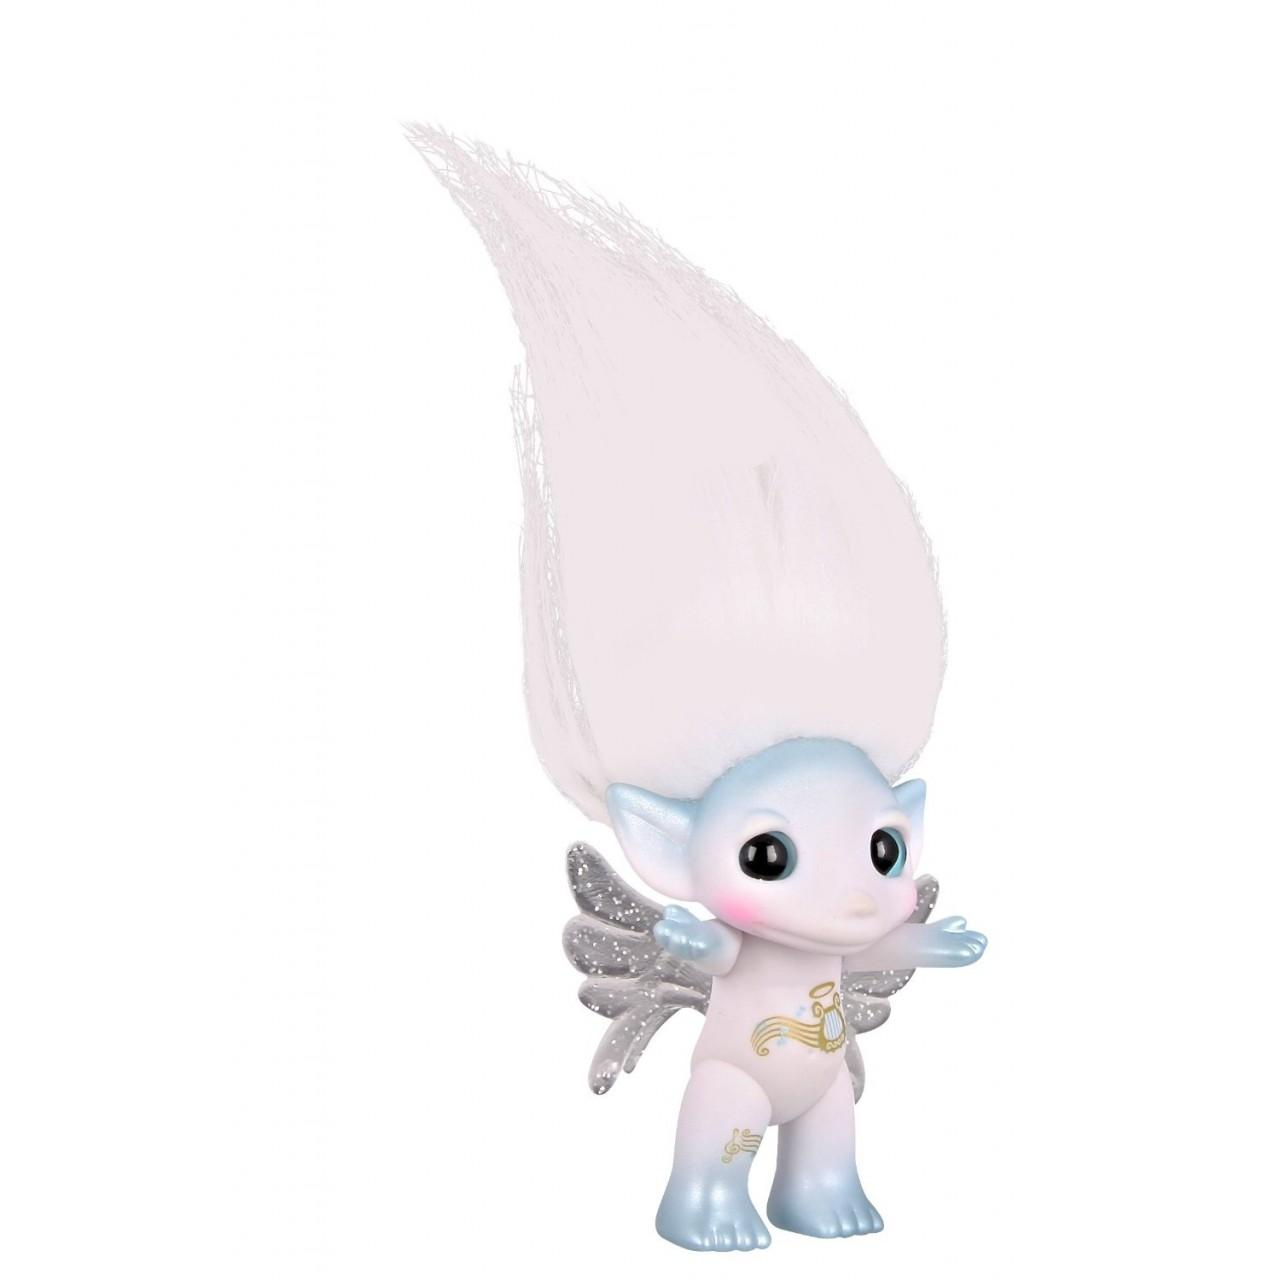 ZELFS Medium Size Angelala Doll